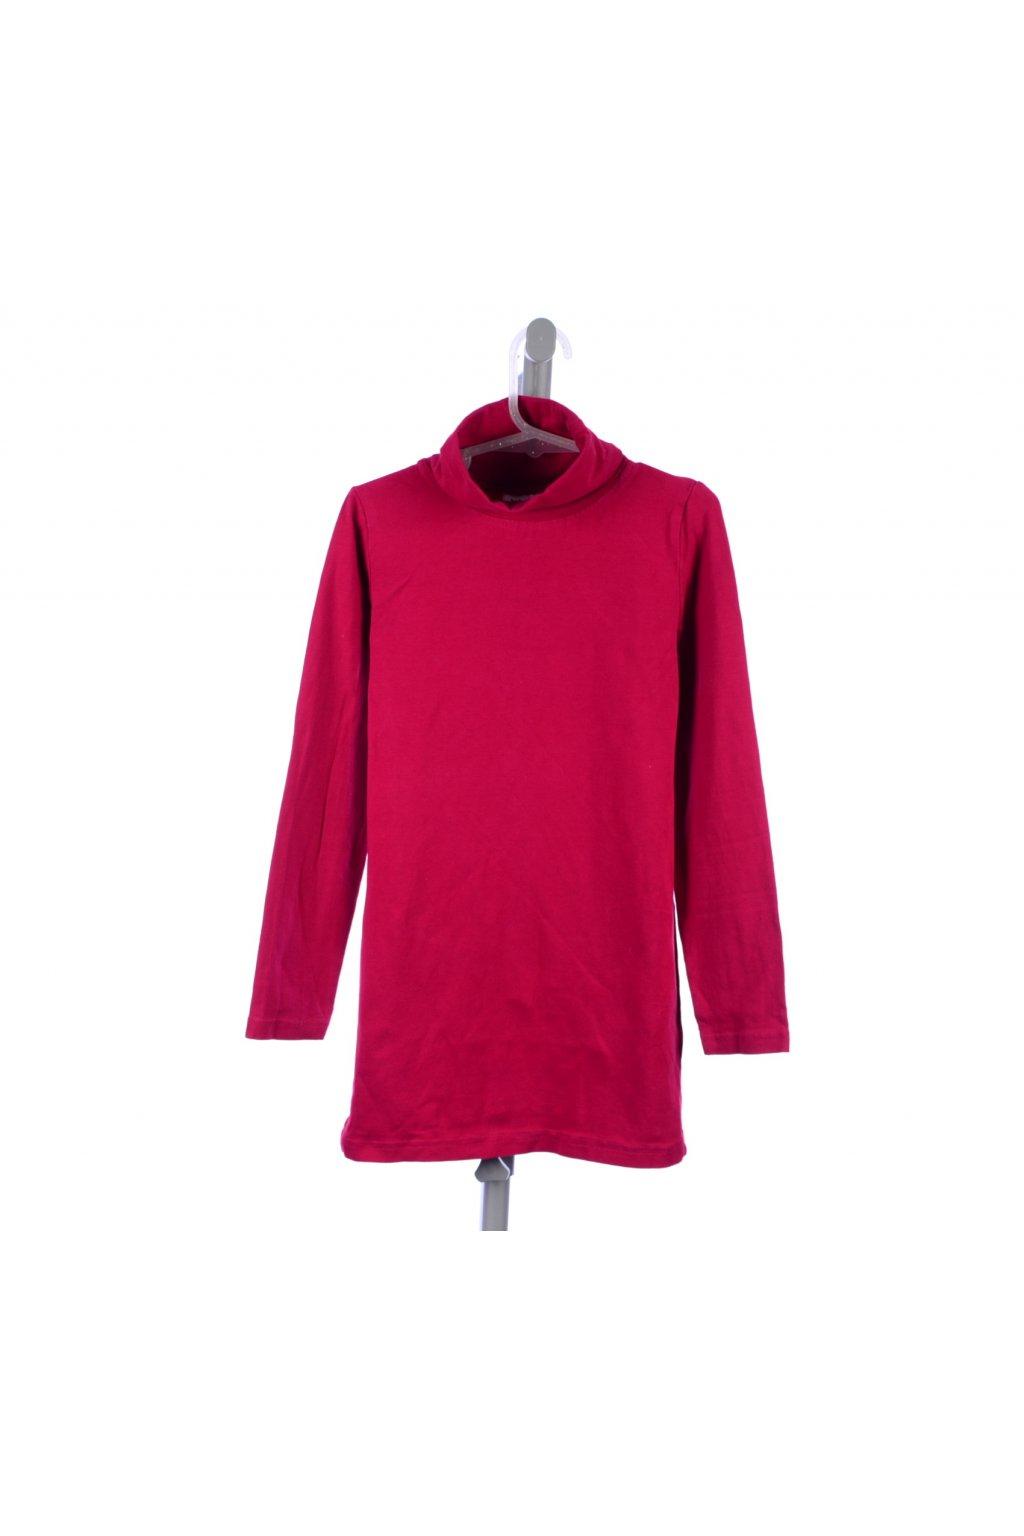 Tričko s rolákem Yigga 128-134 červené